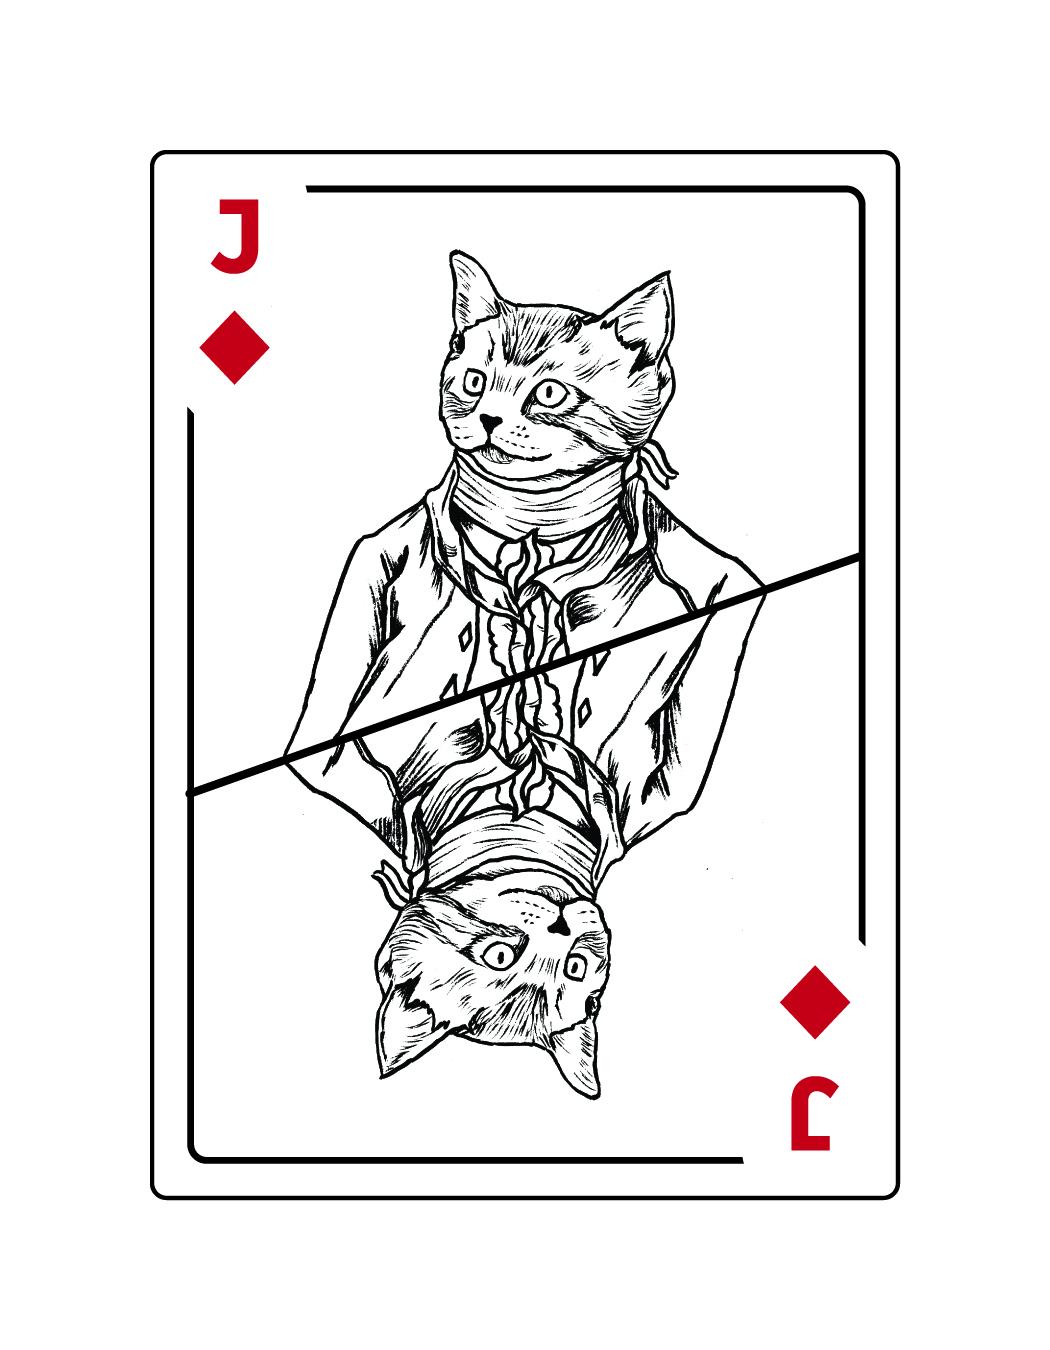 card_draft_1-16.jpg